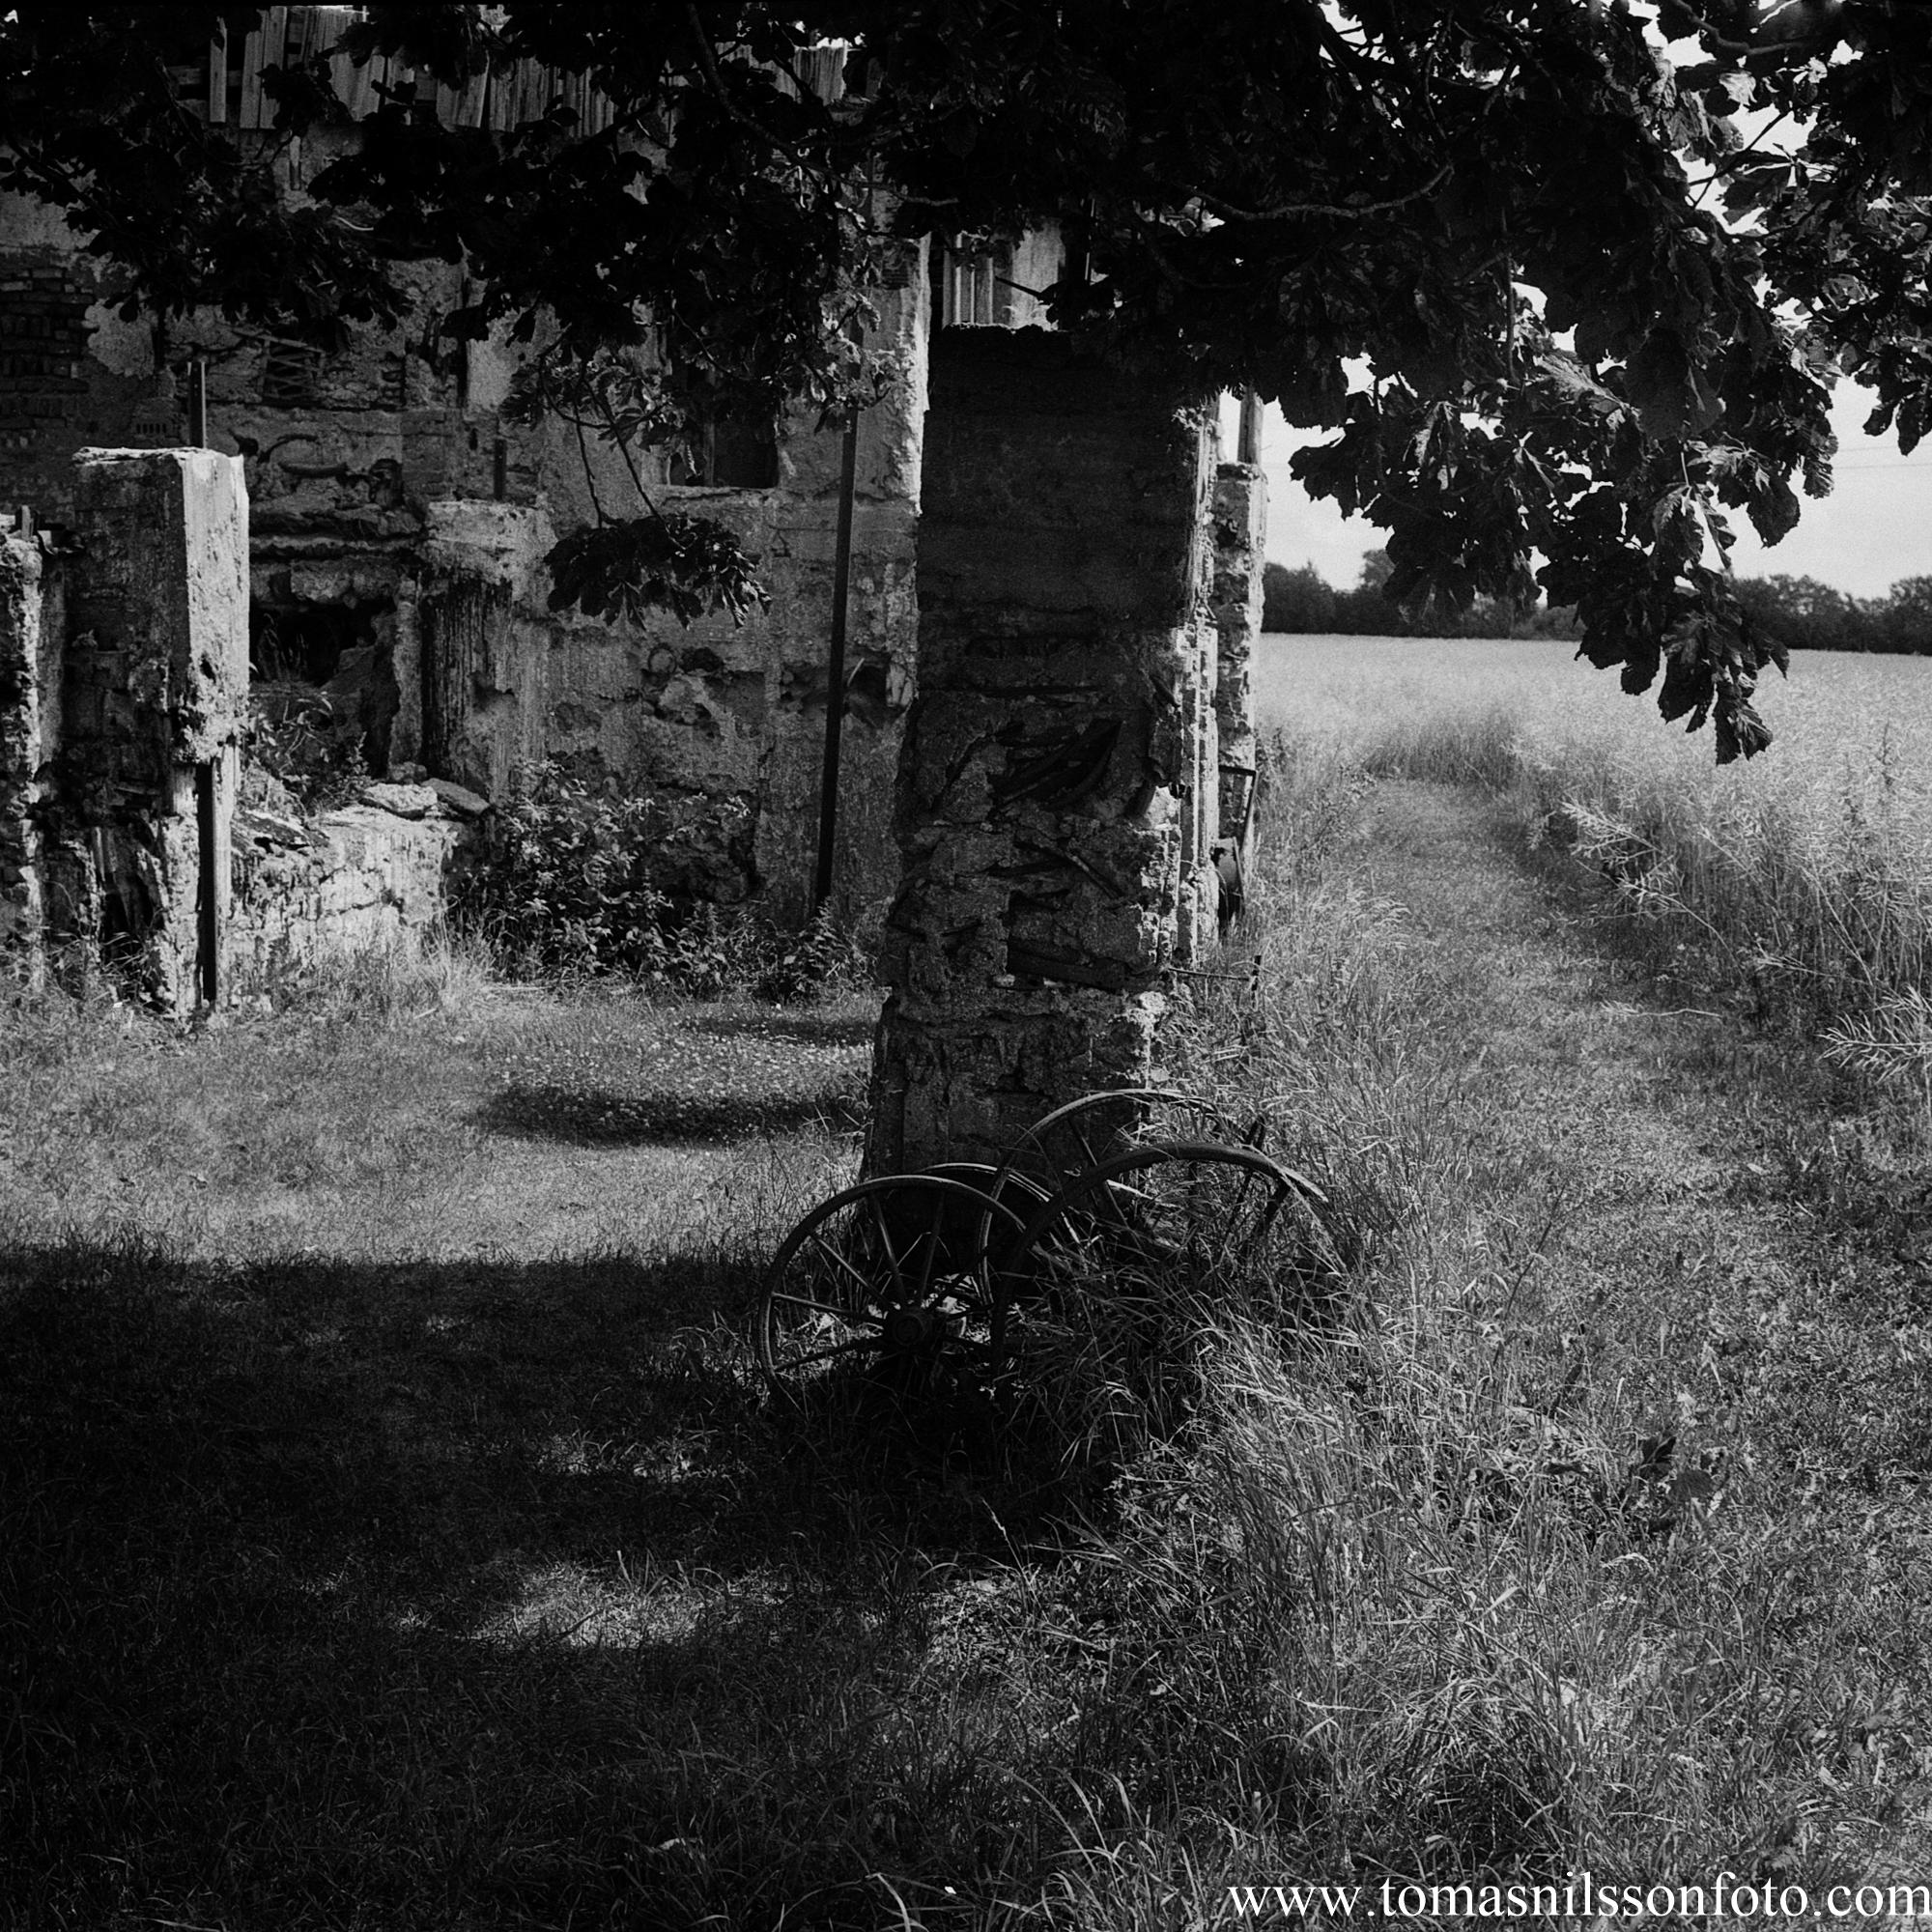 Day 202 - July 21: Abandoned